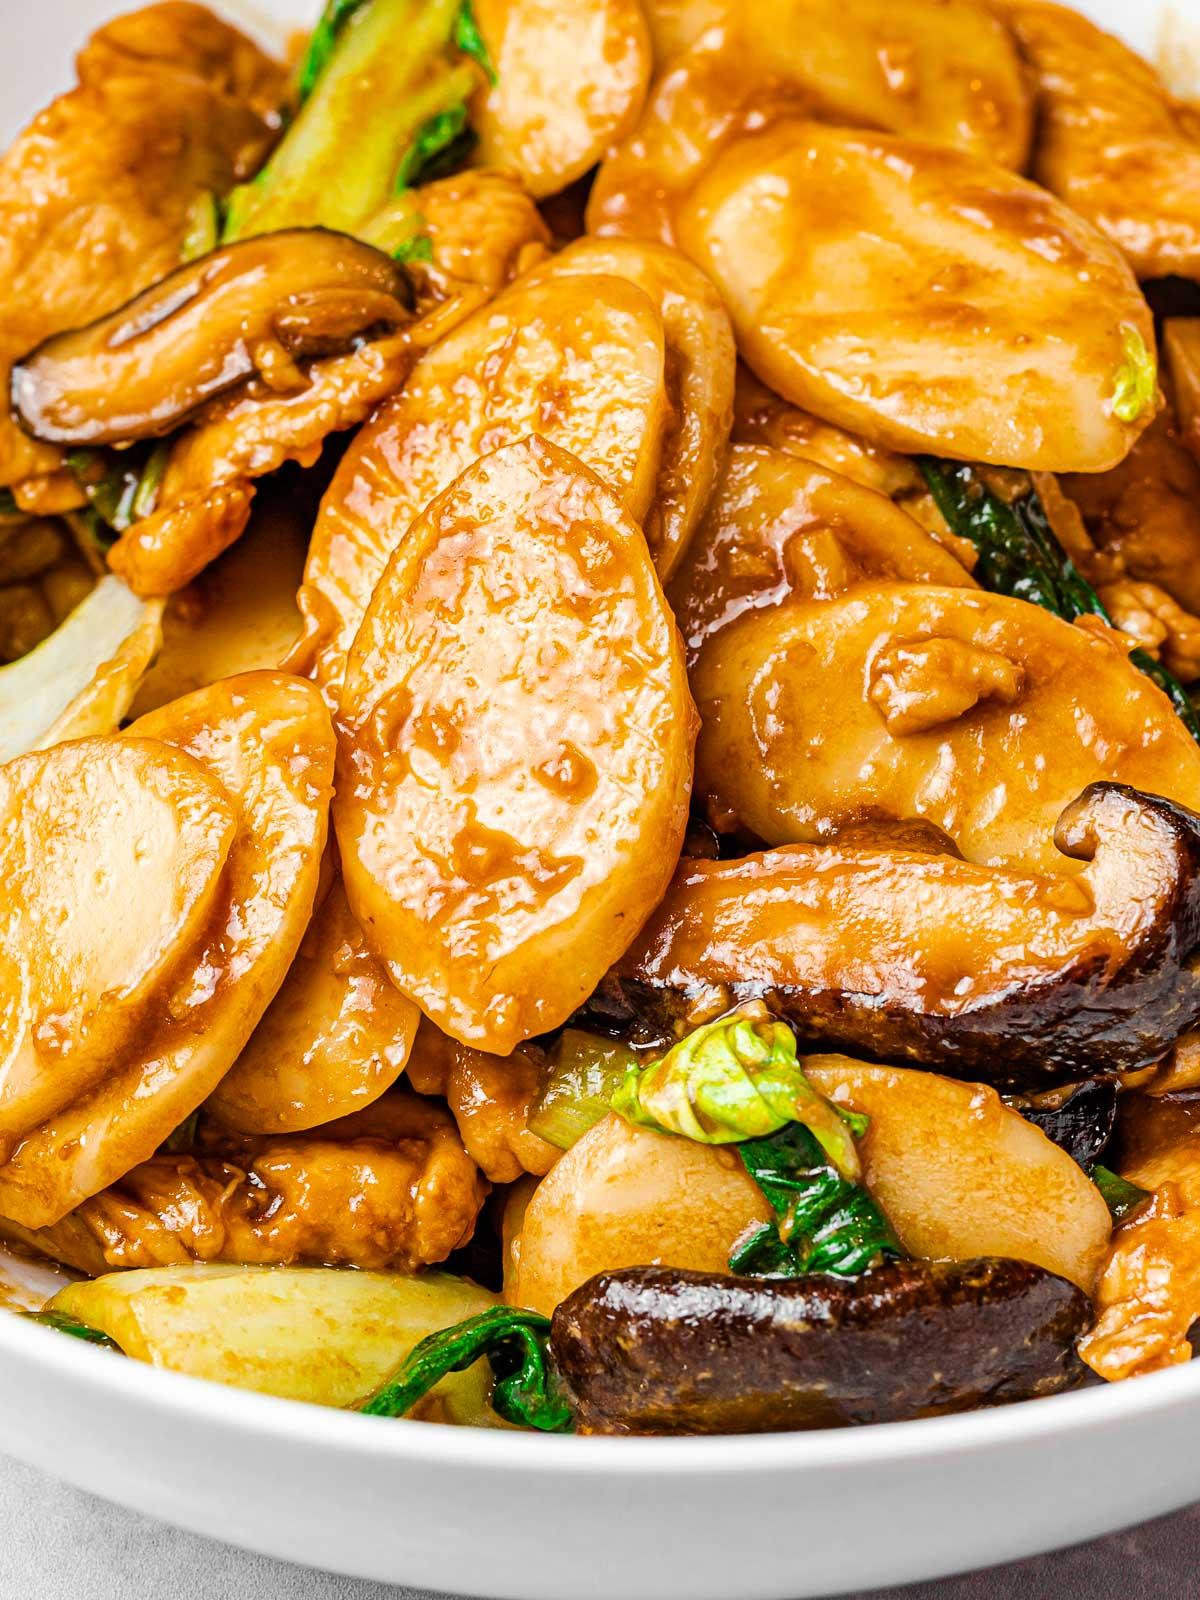 Stir Fried Shanghai Rice Cakes Chao Nian Gao Drive Me Hungry